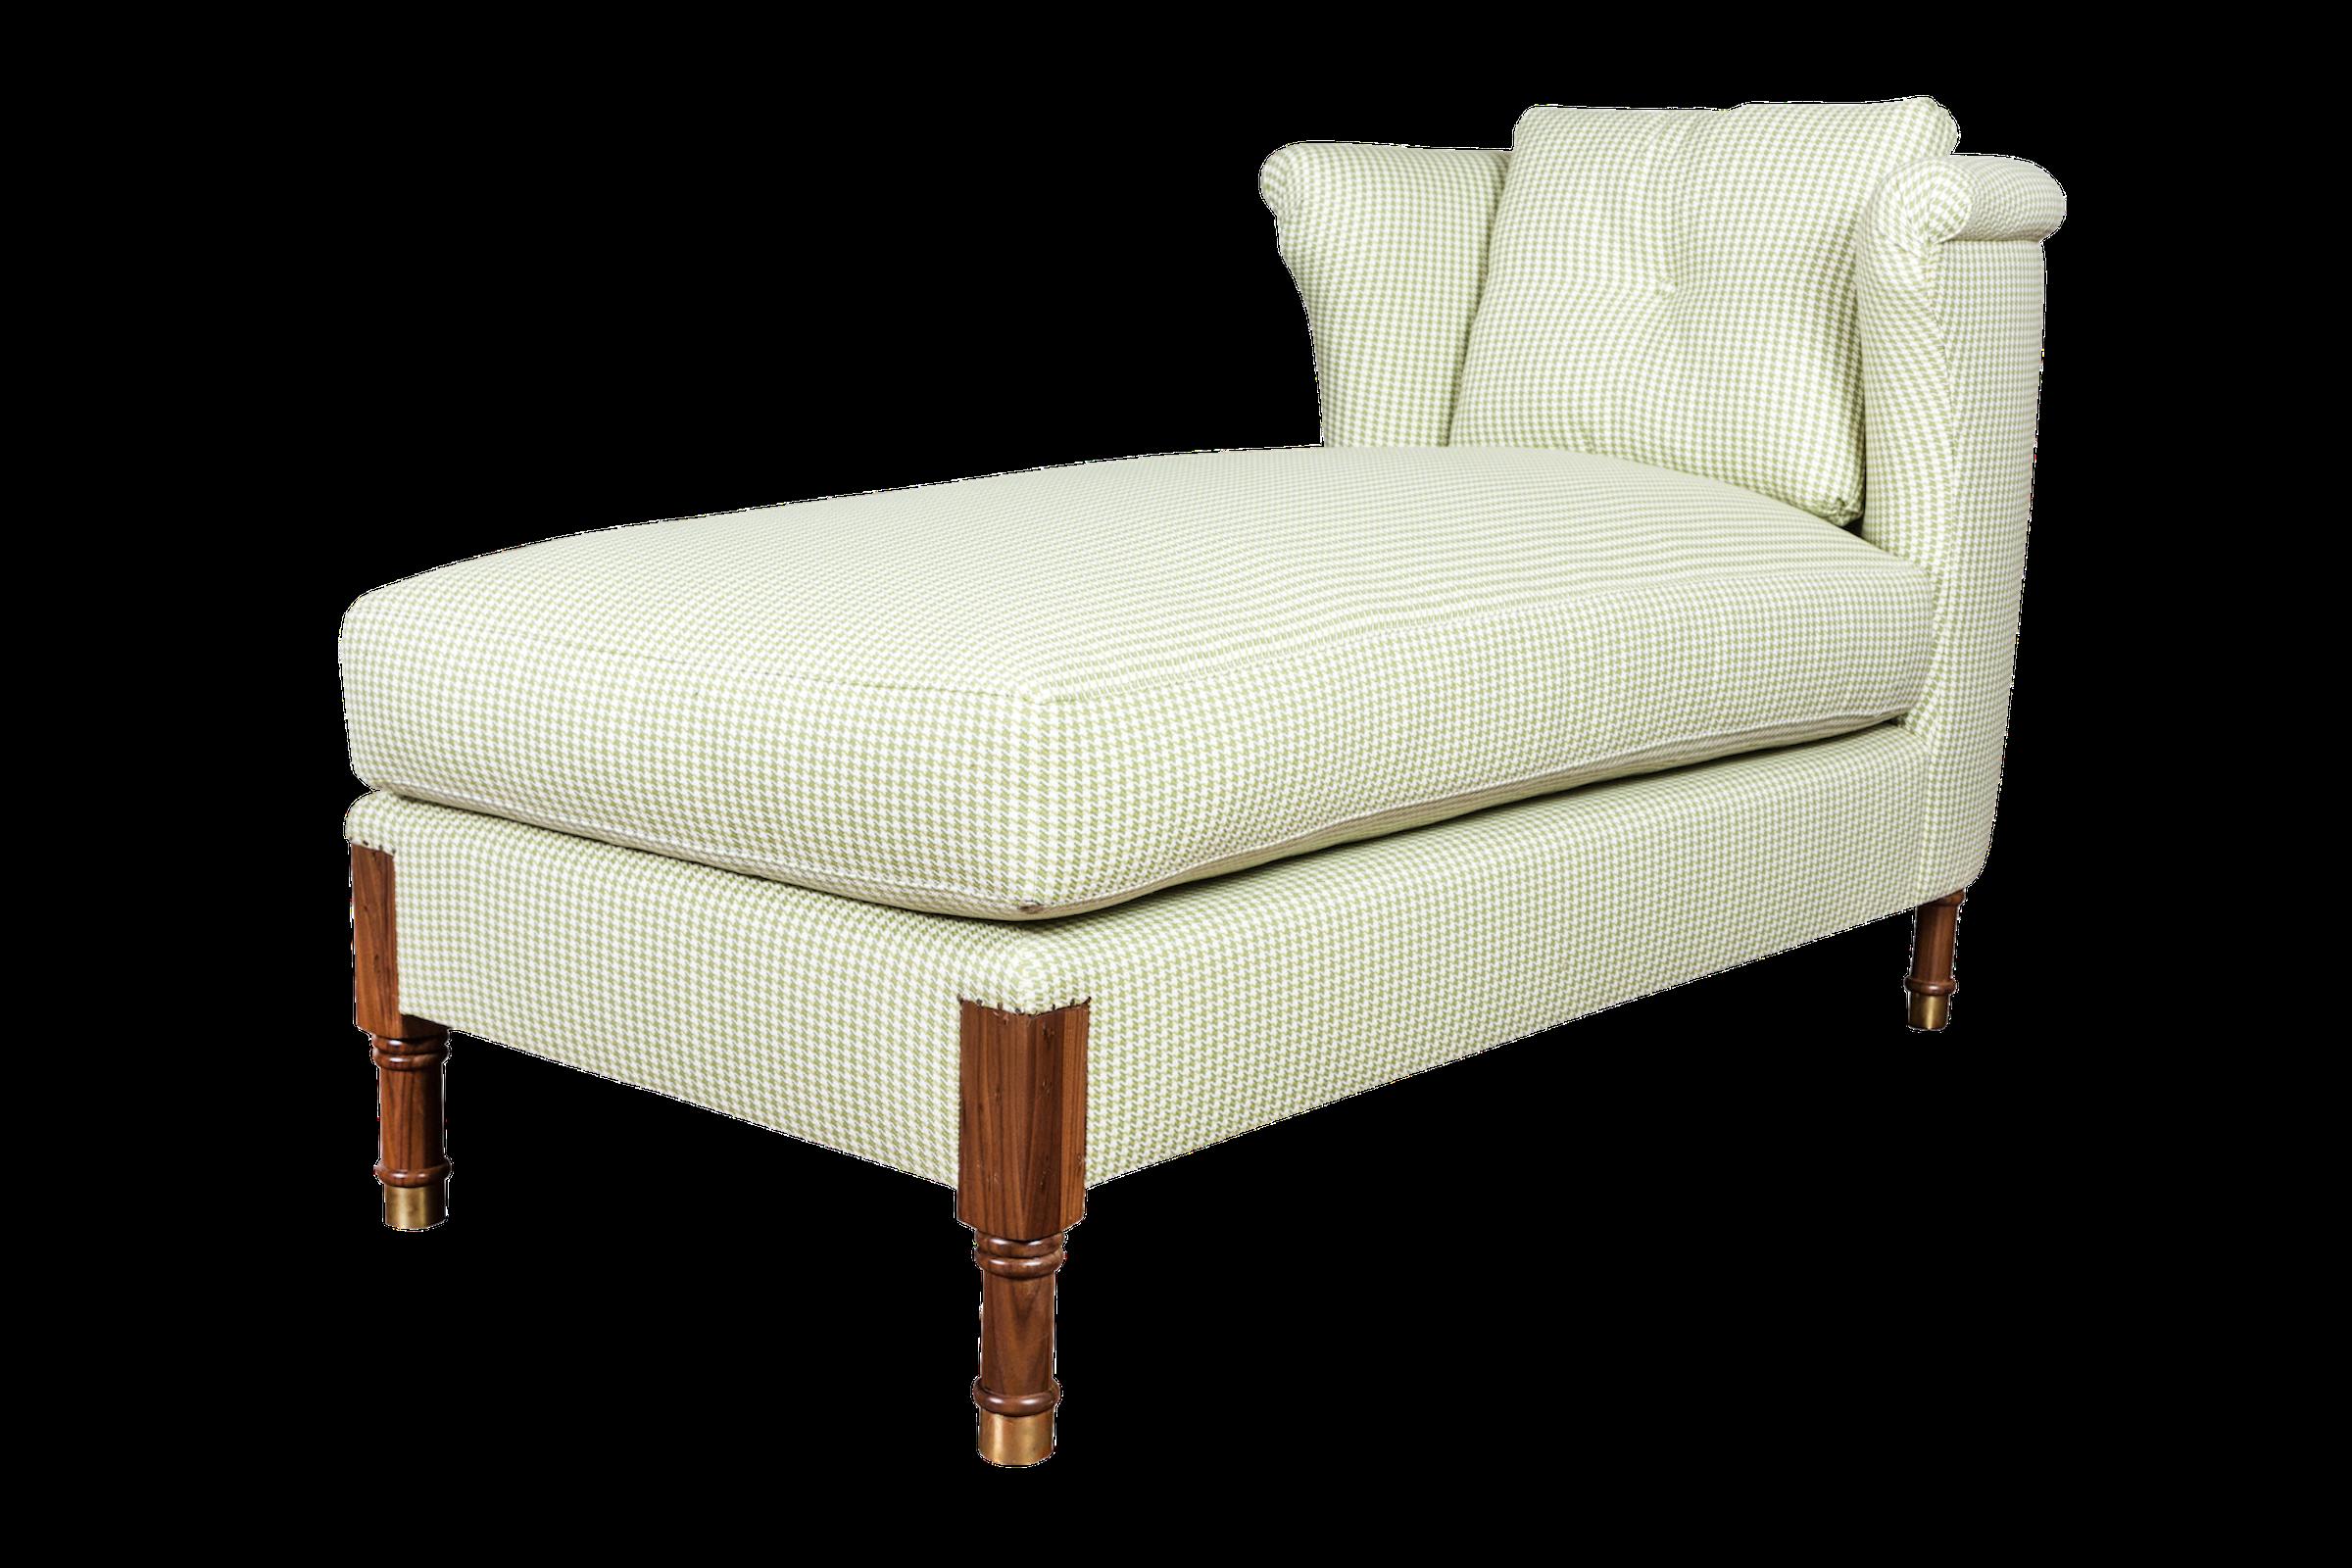 stefani-stein-horizon-chaise-1.png